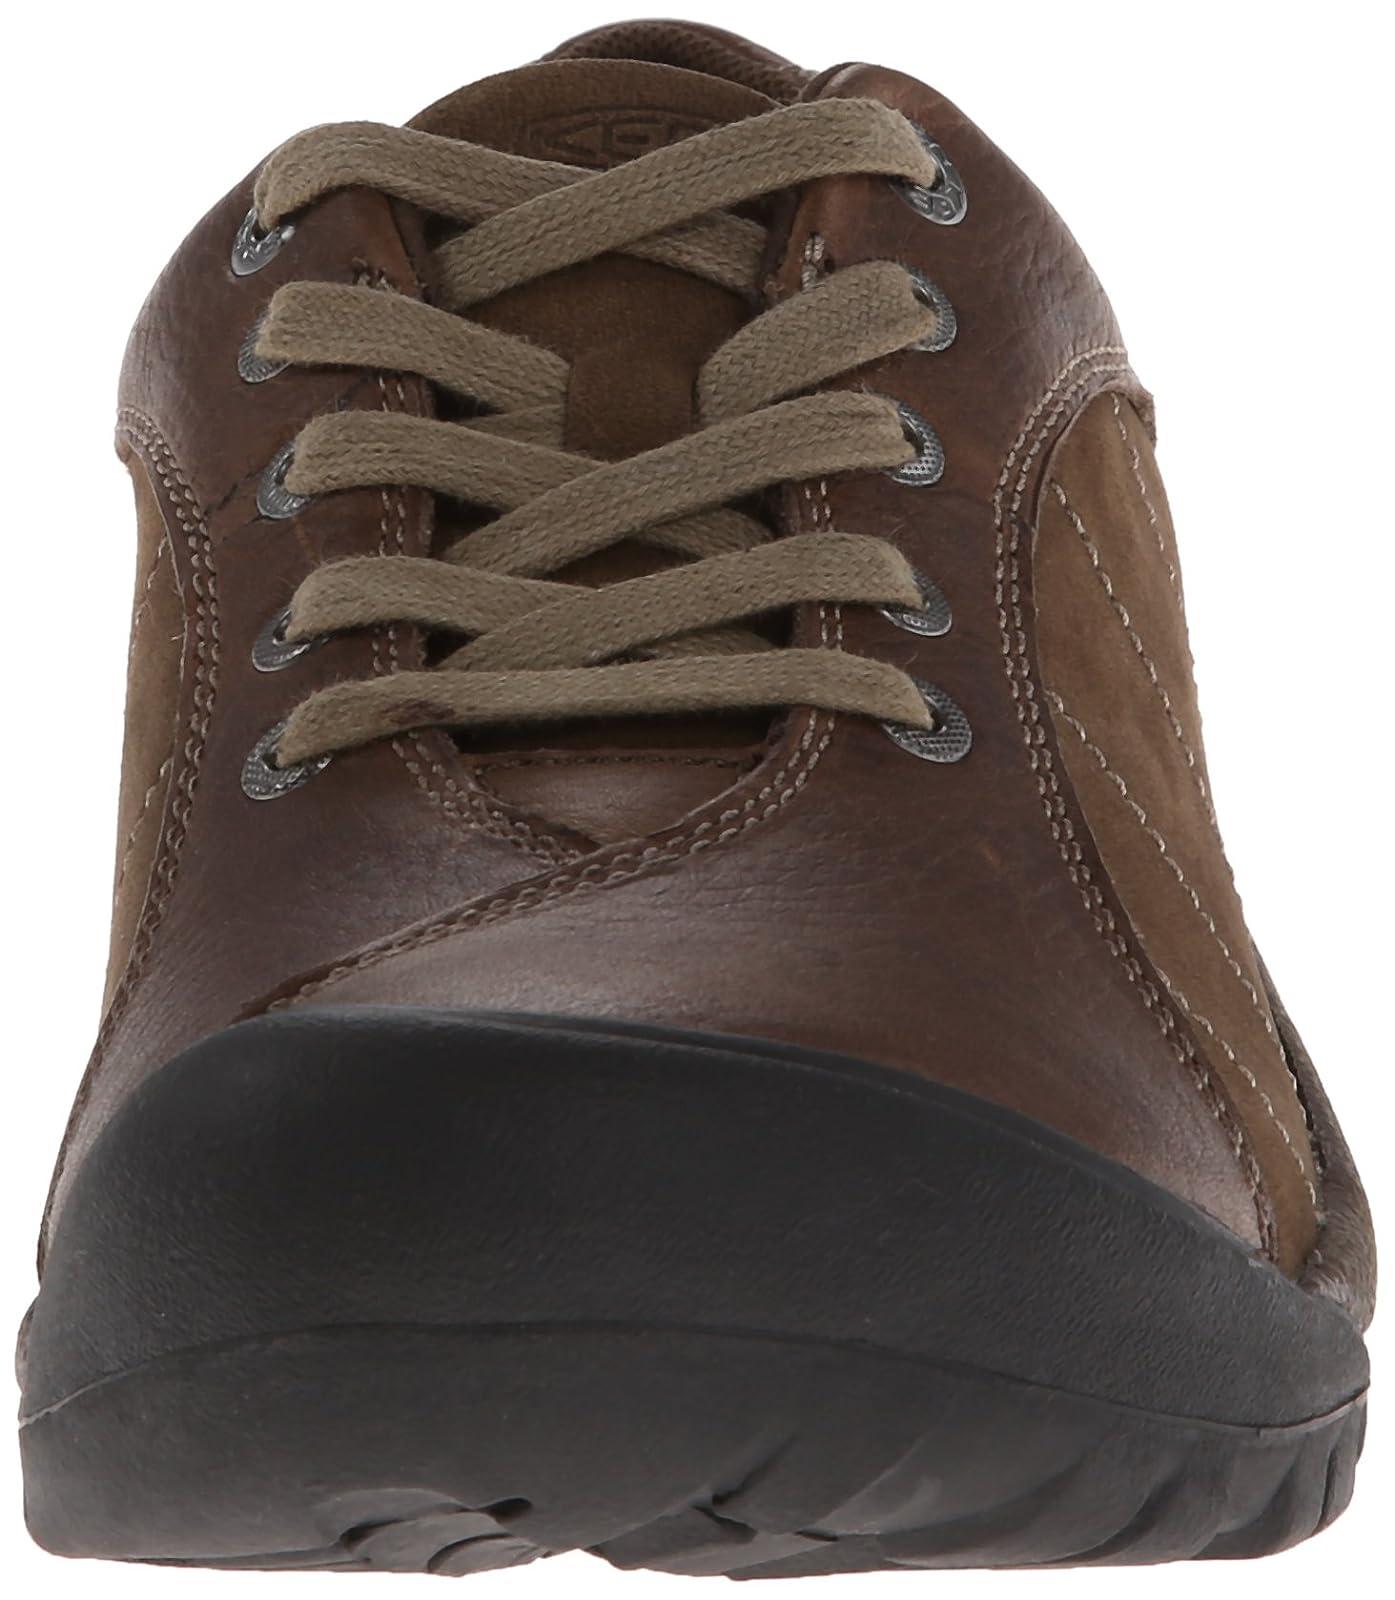 KEEN Women's Presidio Shoe Cascade Brown/Shitake 9.5 M US Women - 4